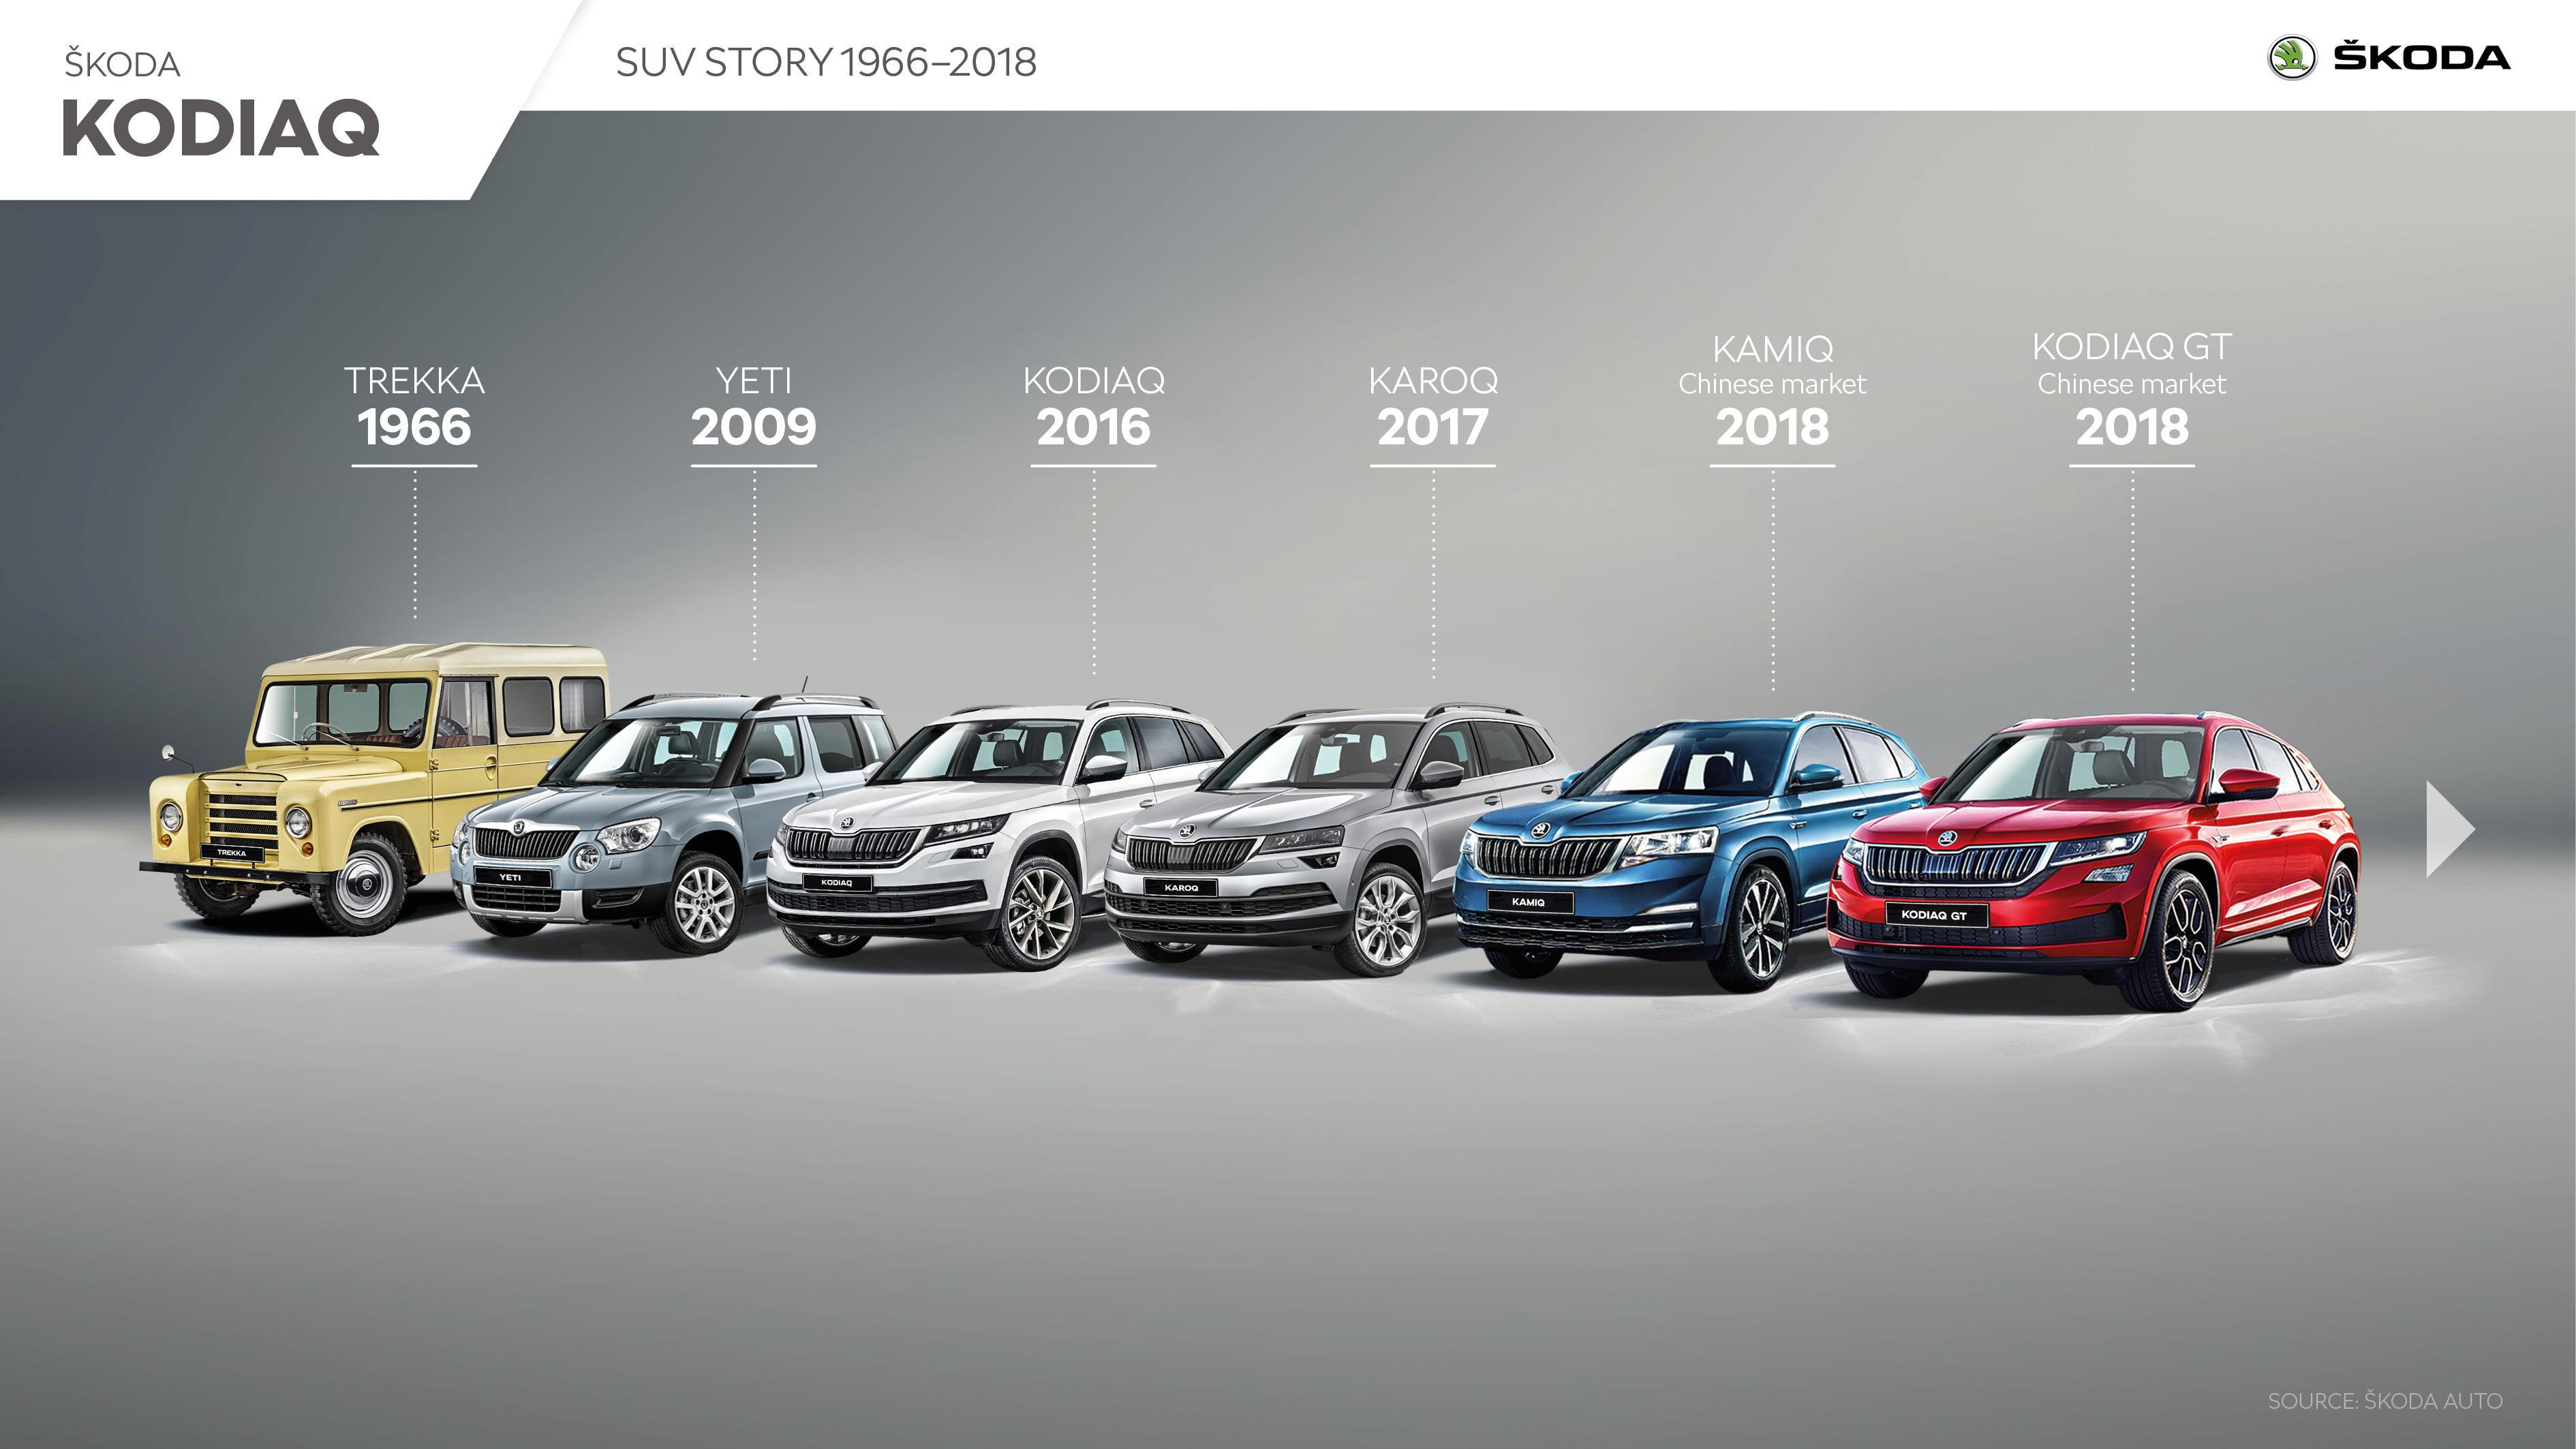 ŠKODA KODIAQ - Infographic